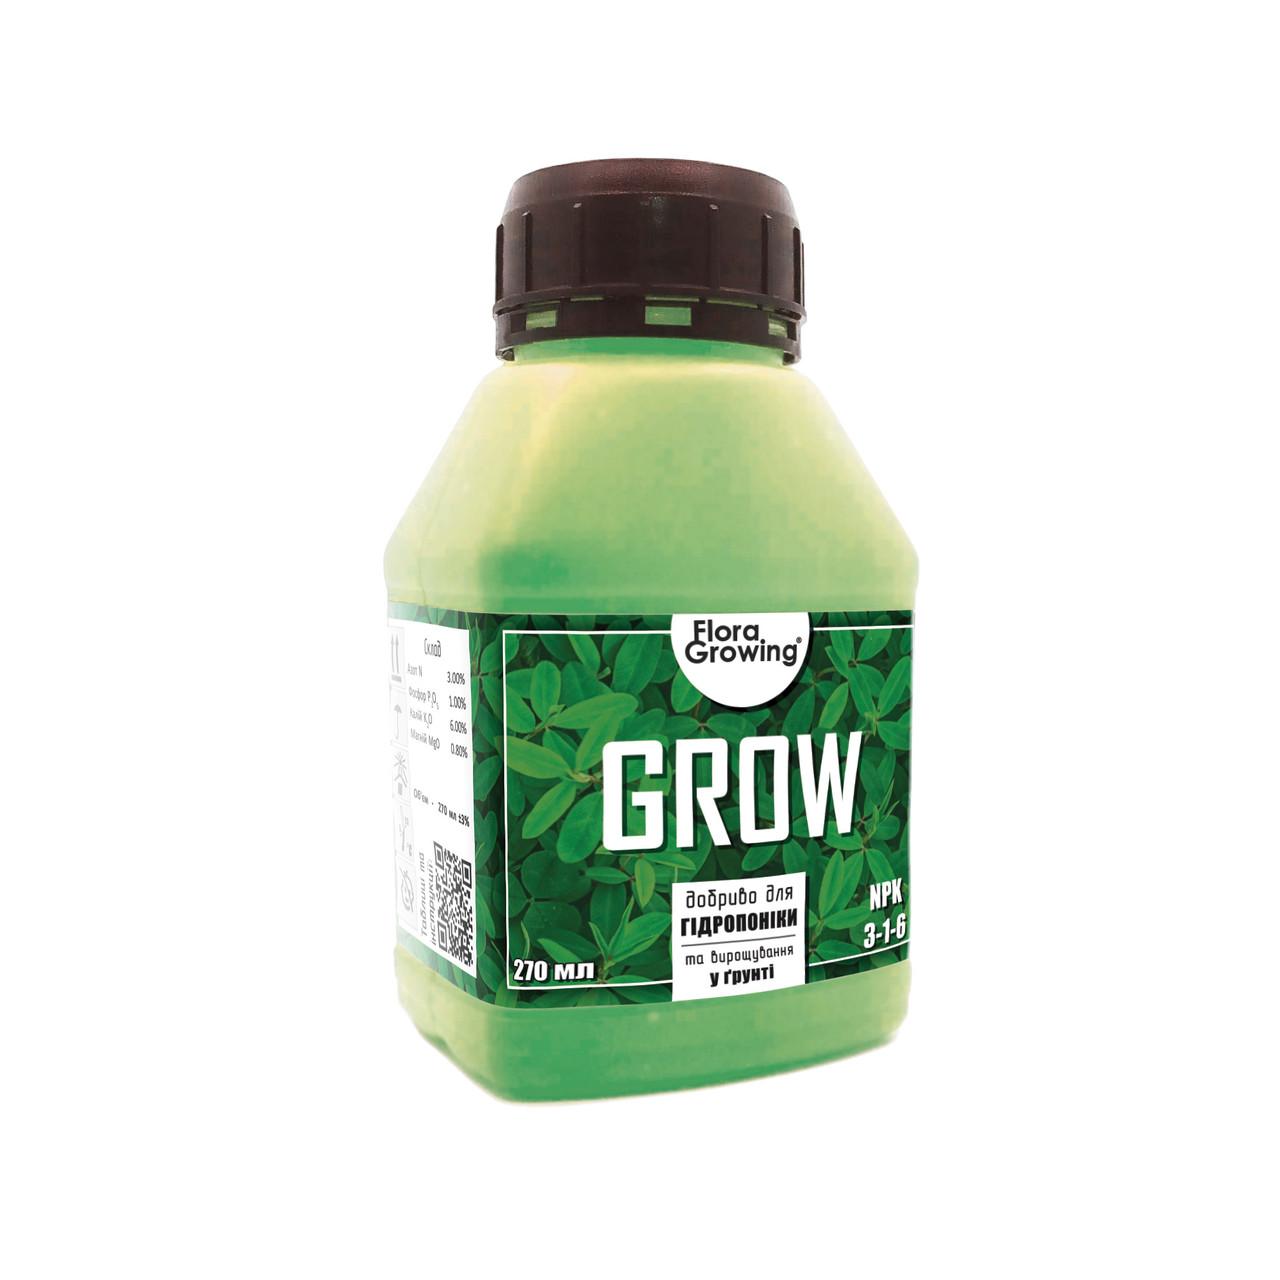 270 мл Grow - компонент удобрений для гидропоники и почвы аналог GHE